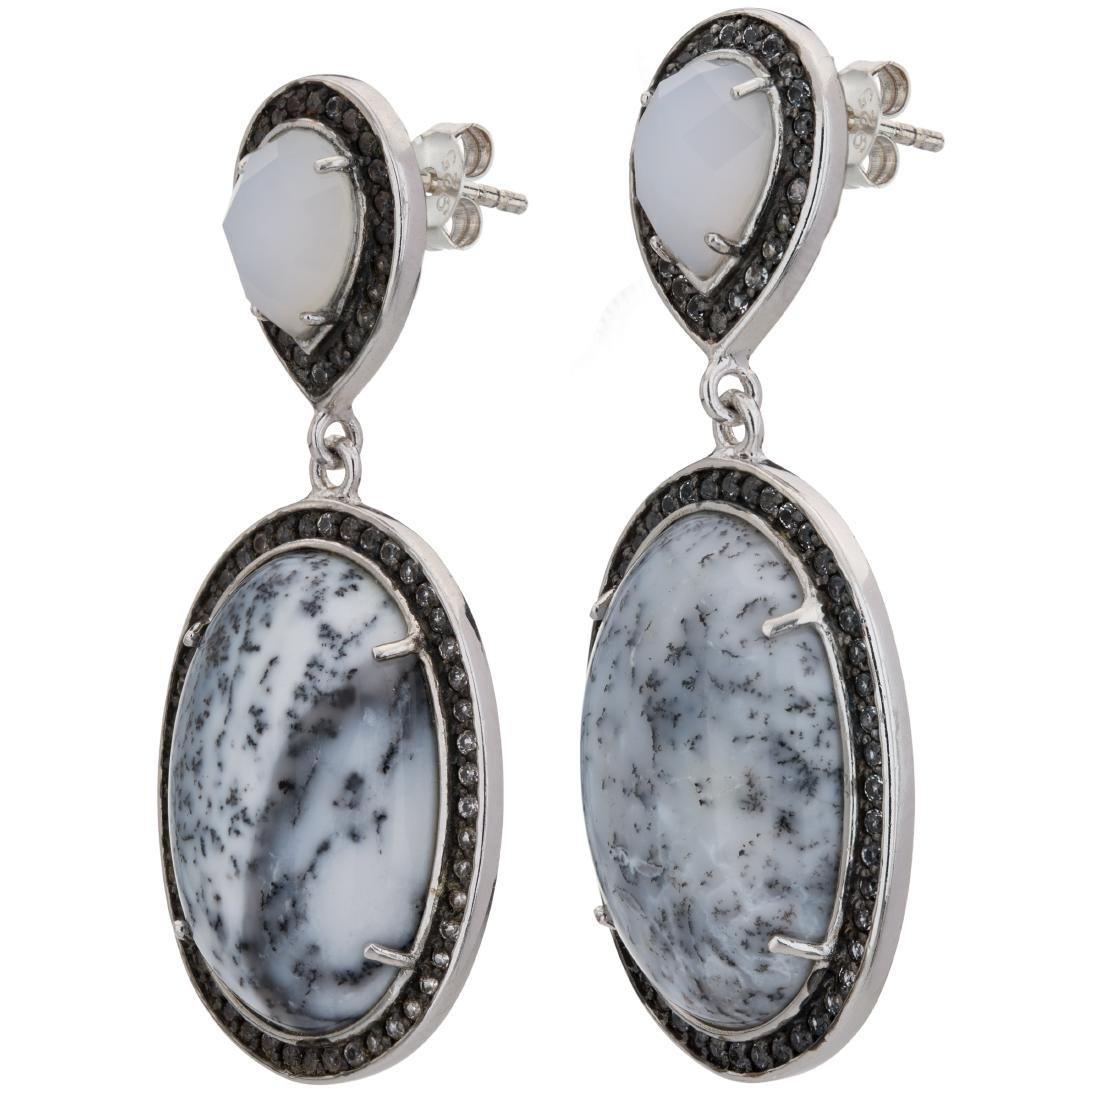 Dendritic Agate White Chalcedony & White Topaz Earrings